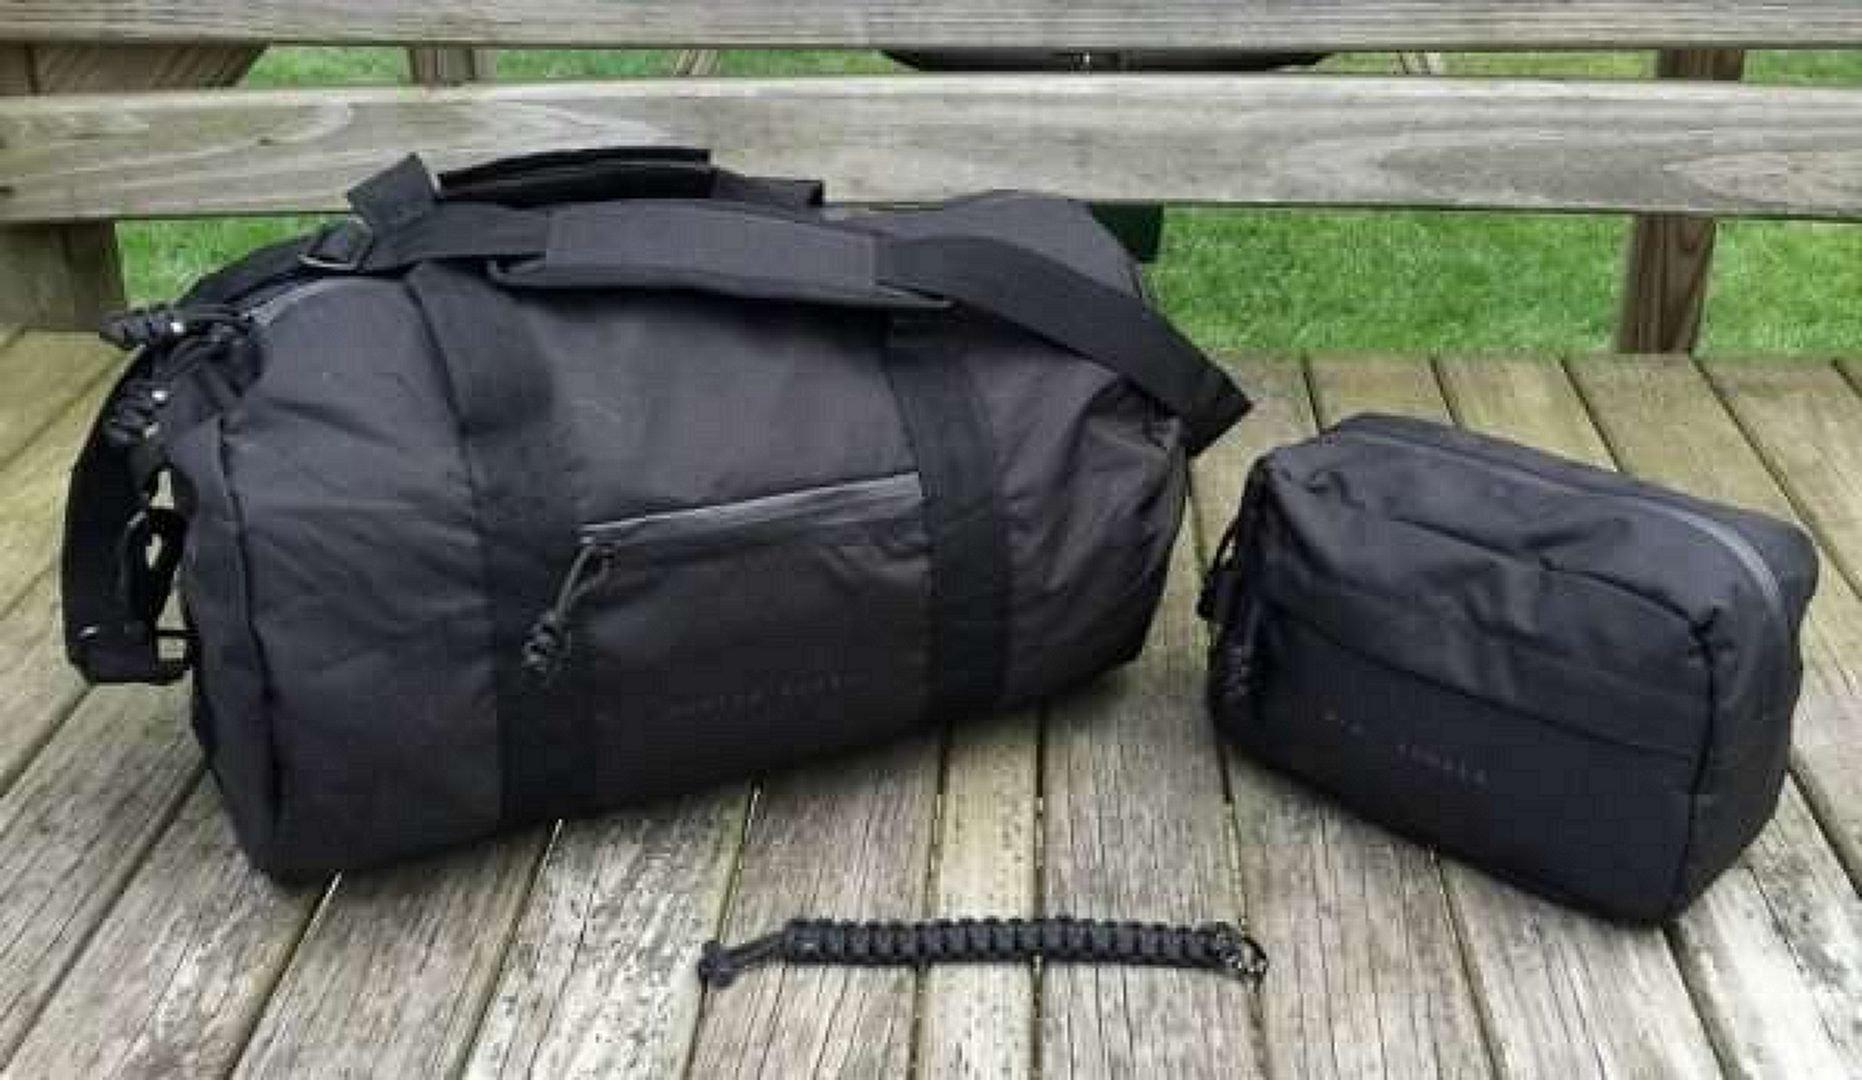 Two duffel bags, Black